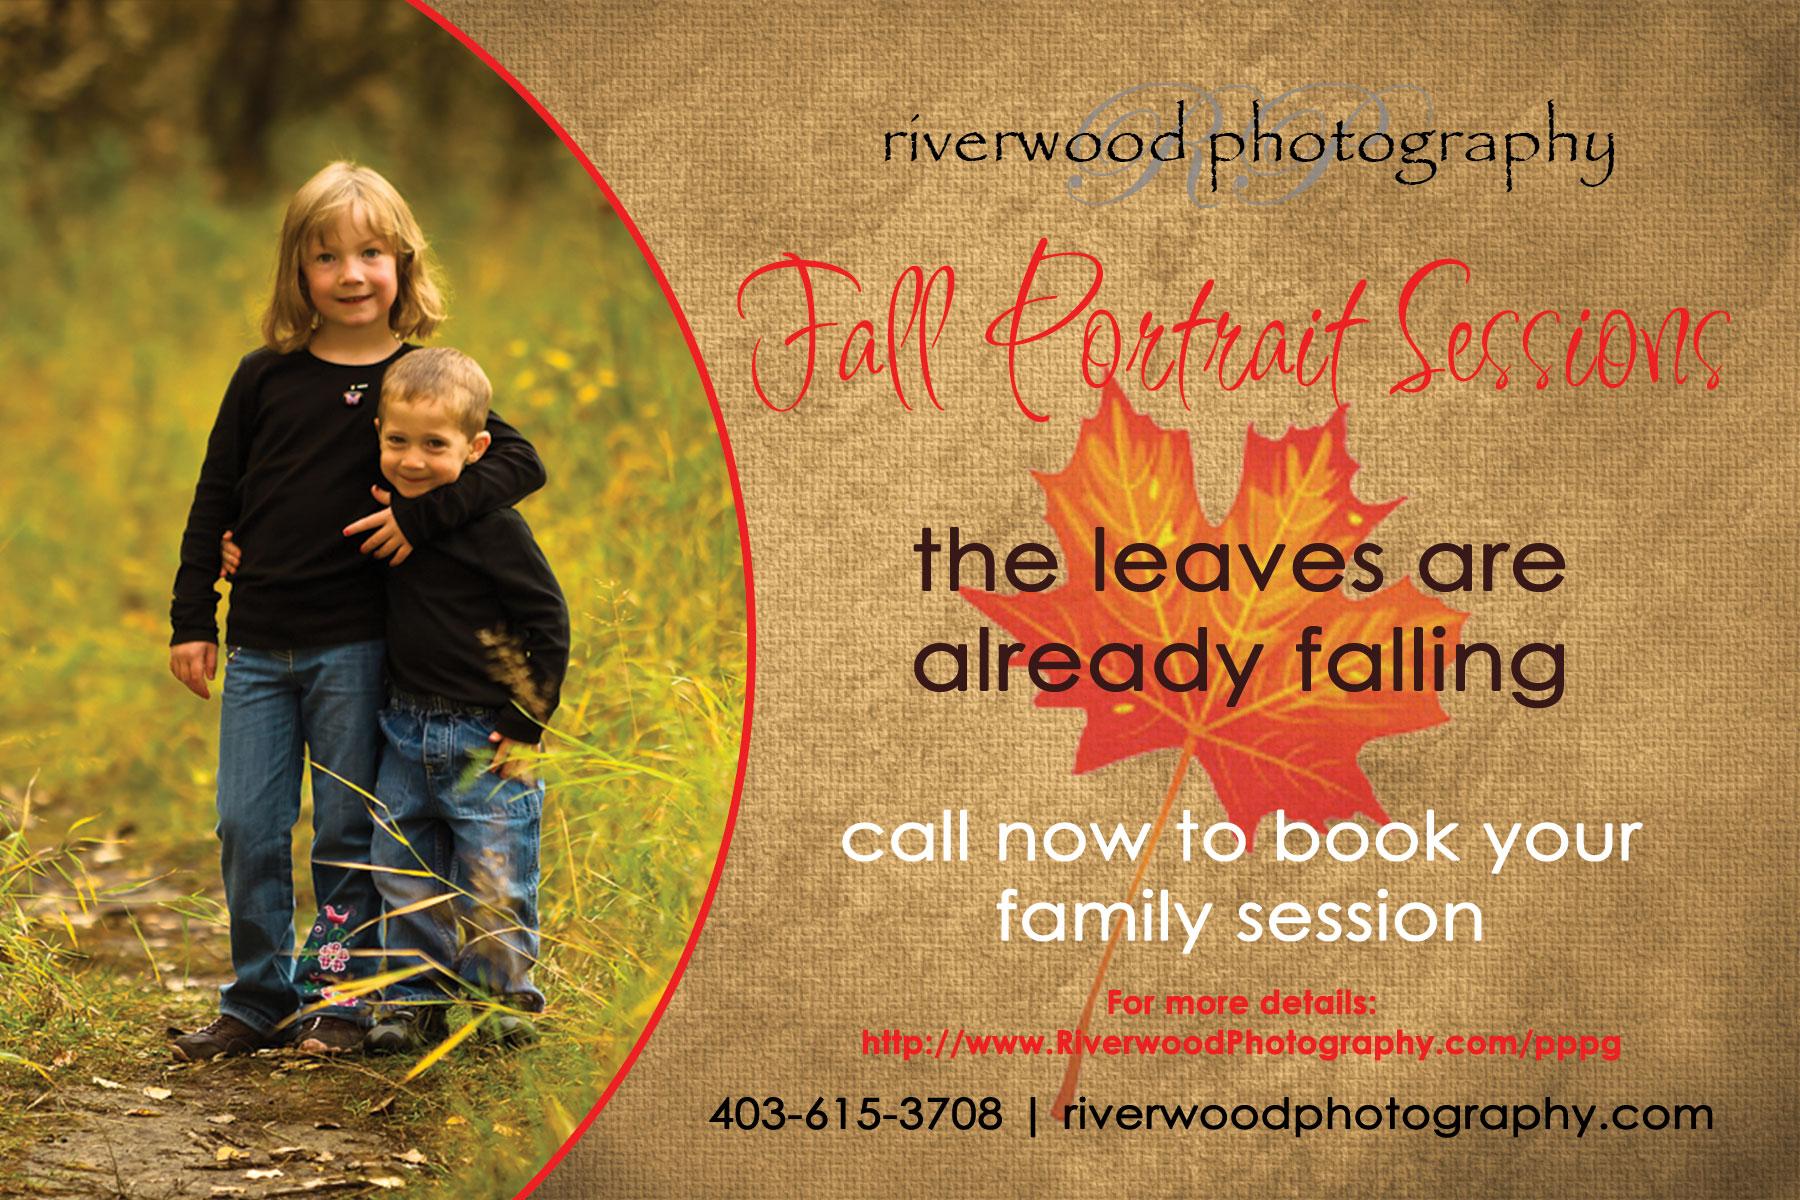 Calgary Fall Portrait Sessions